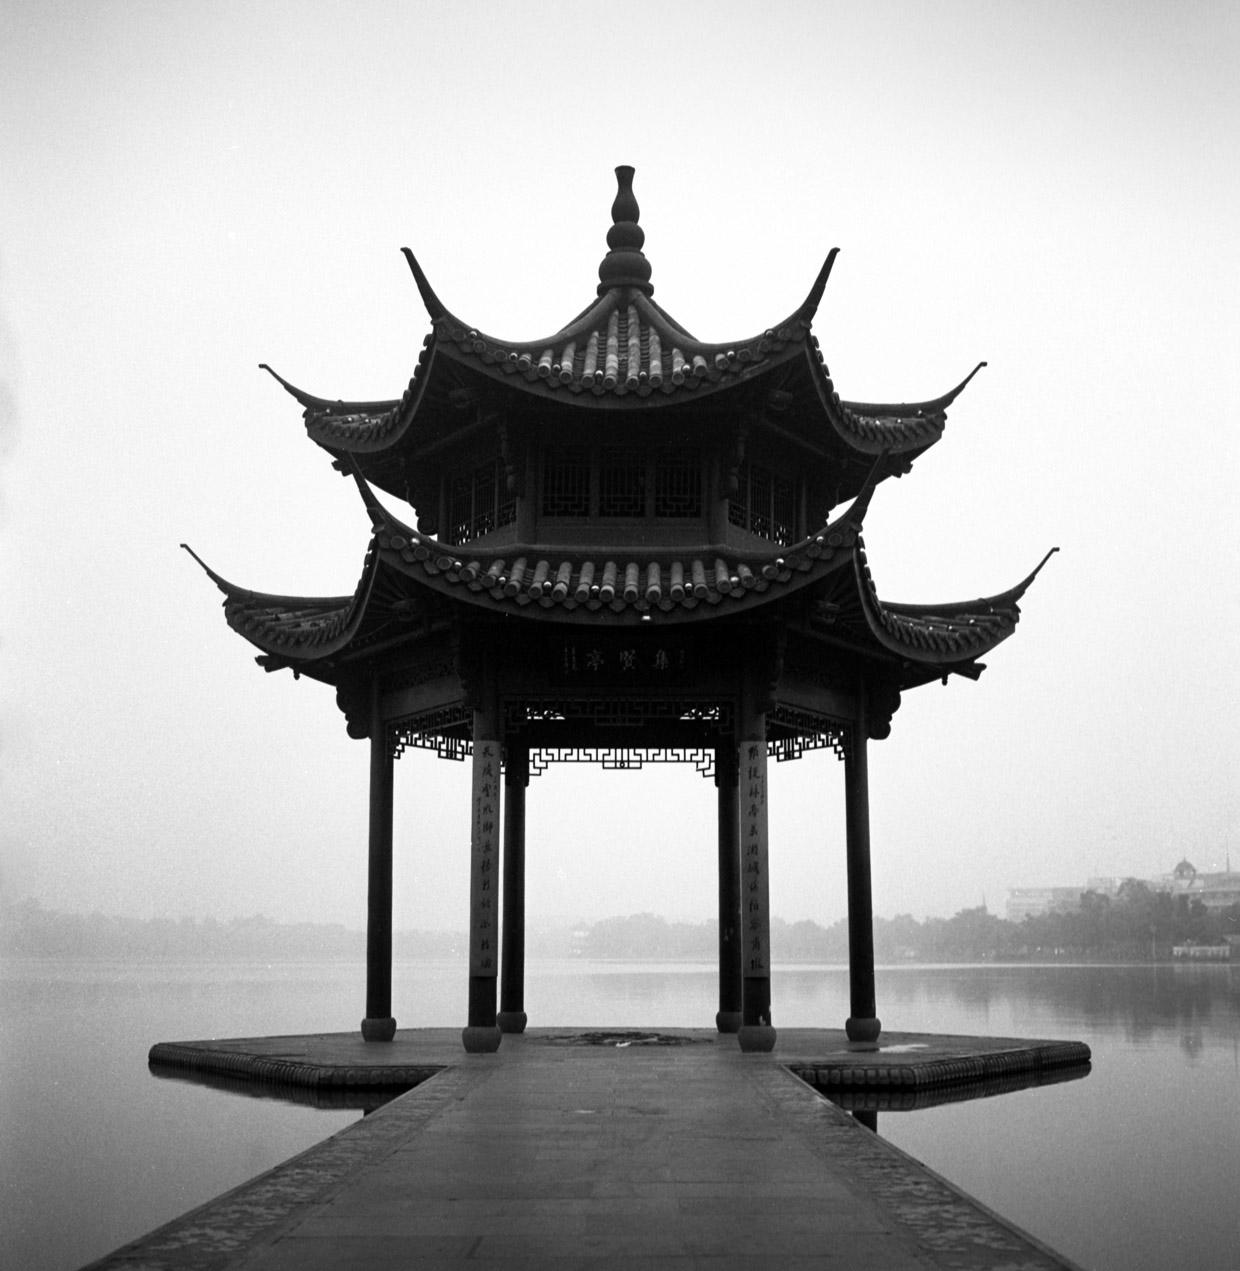 West lake I, Hangzhou